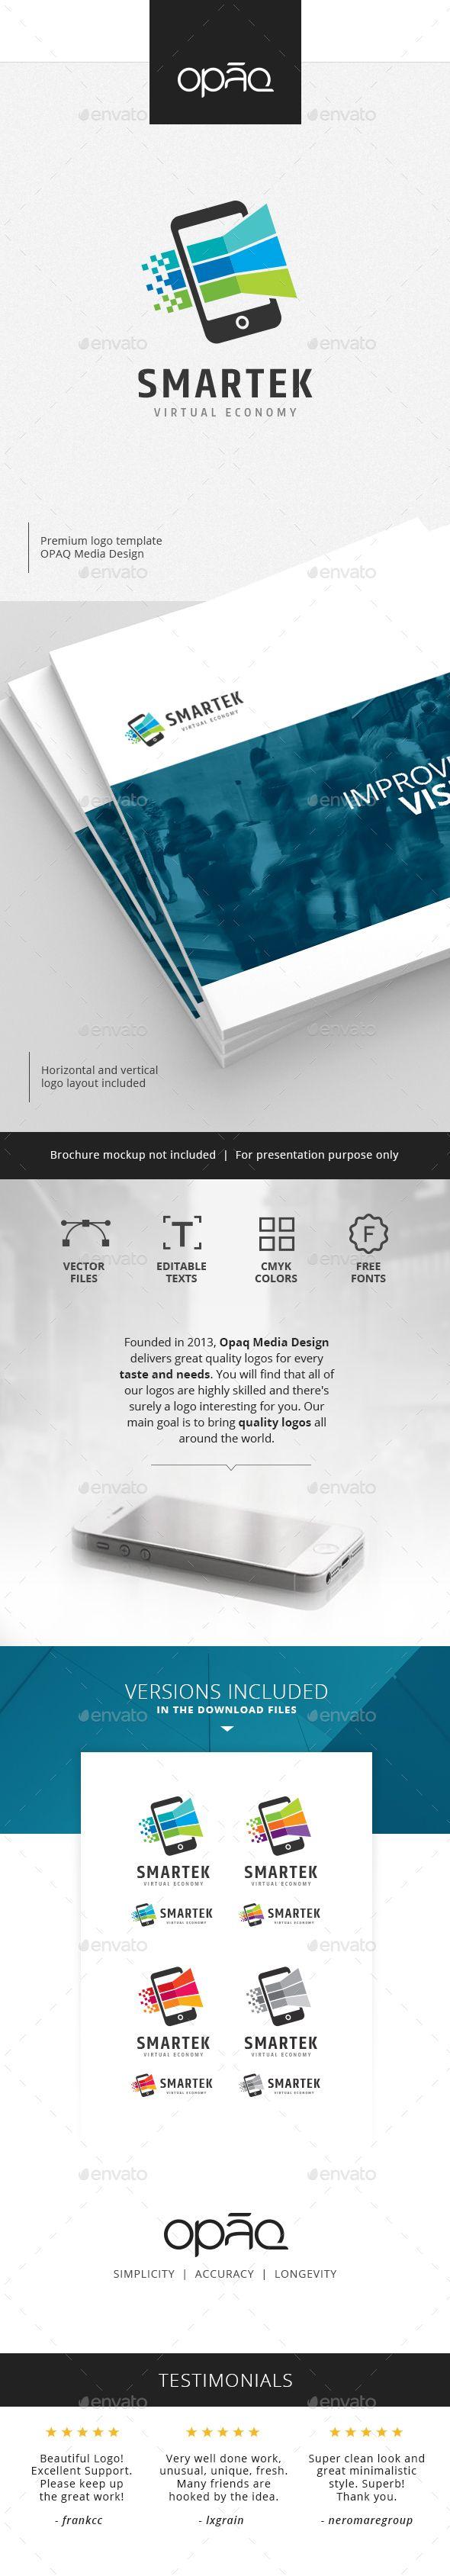 51 best p images on pinterest brand design logo designing and